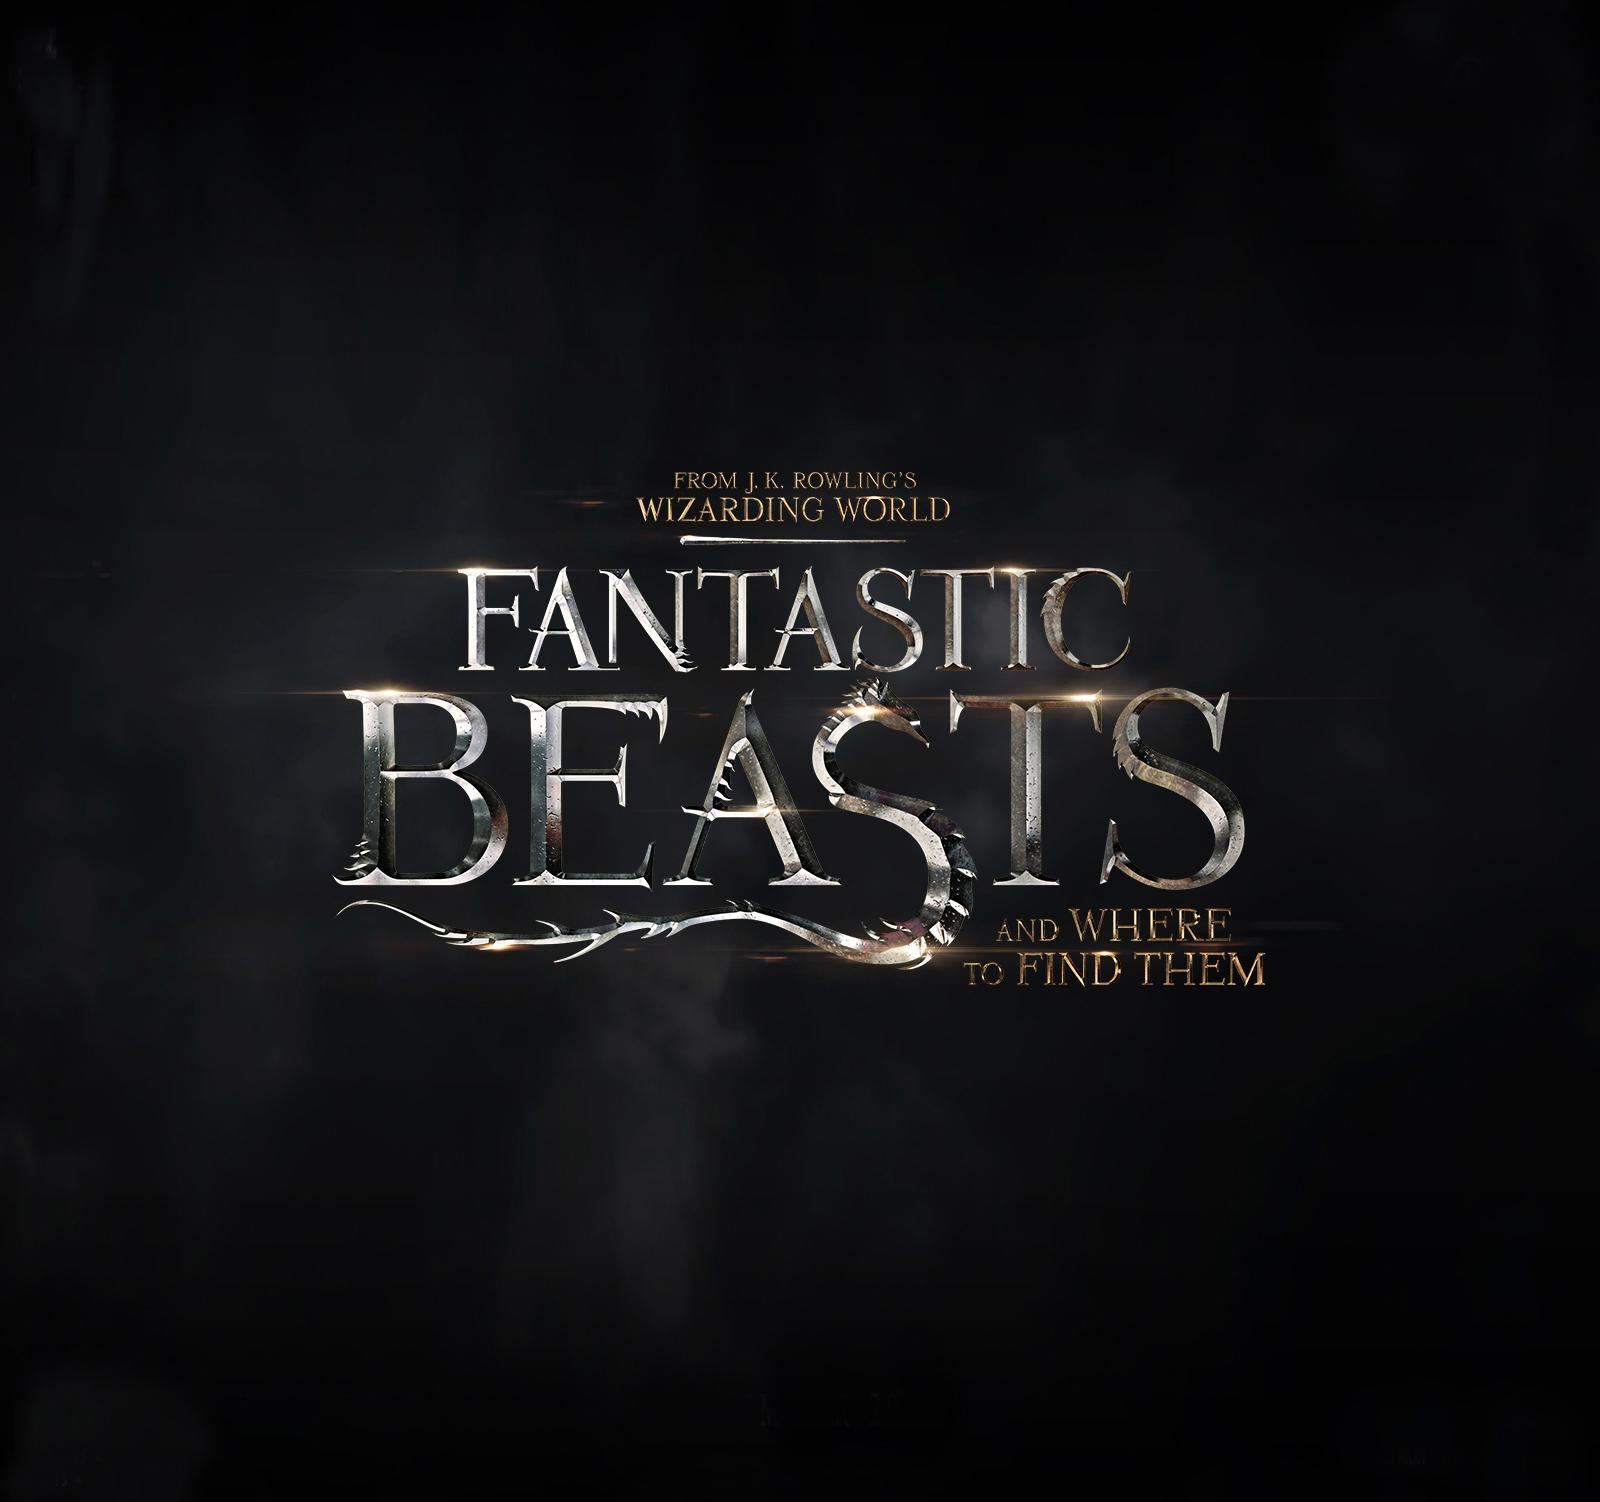 Fantastic_Beasts_logo.JPG